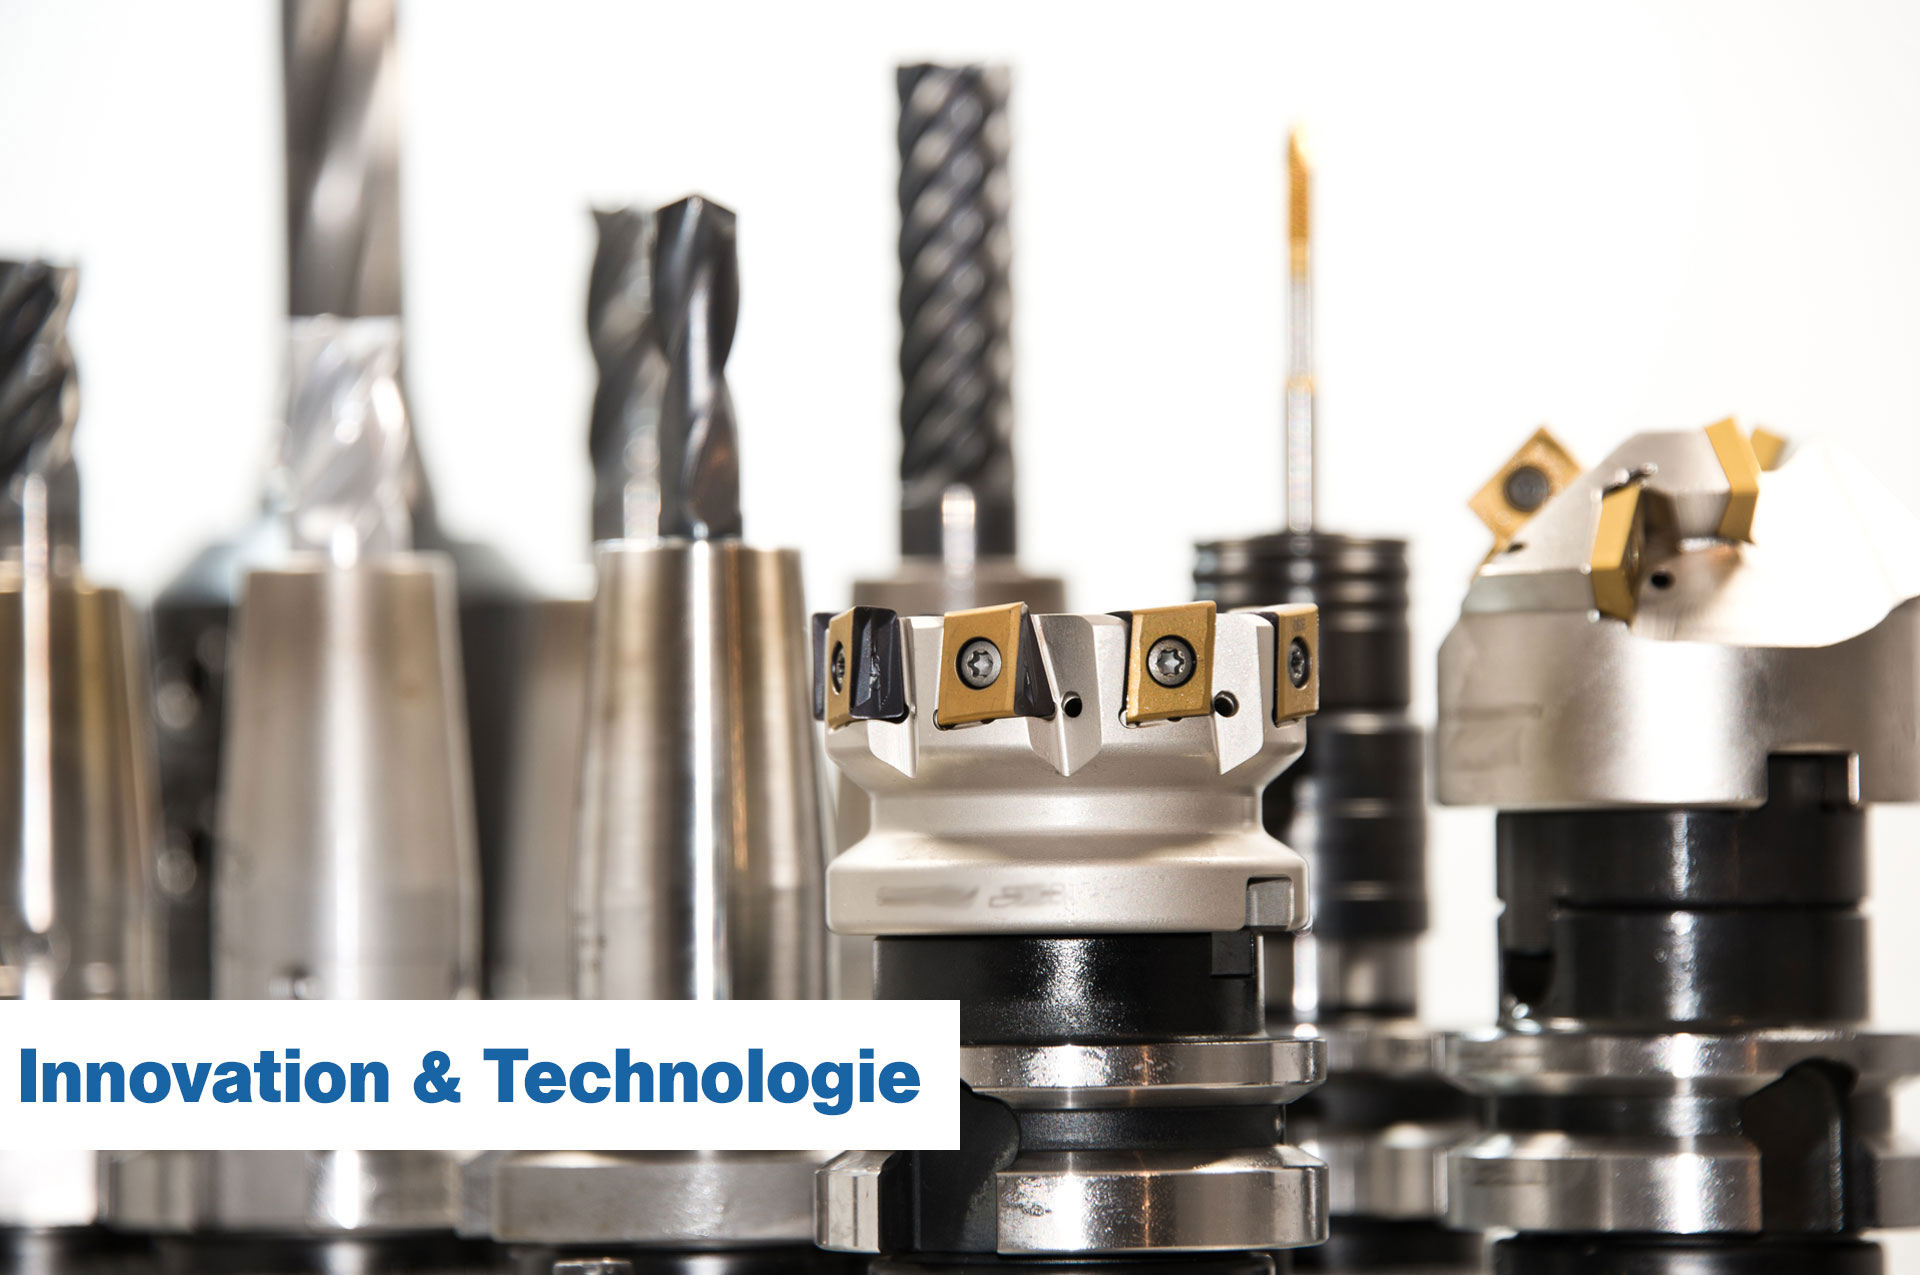 Innovationsberatung und Technologieberatung